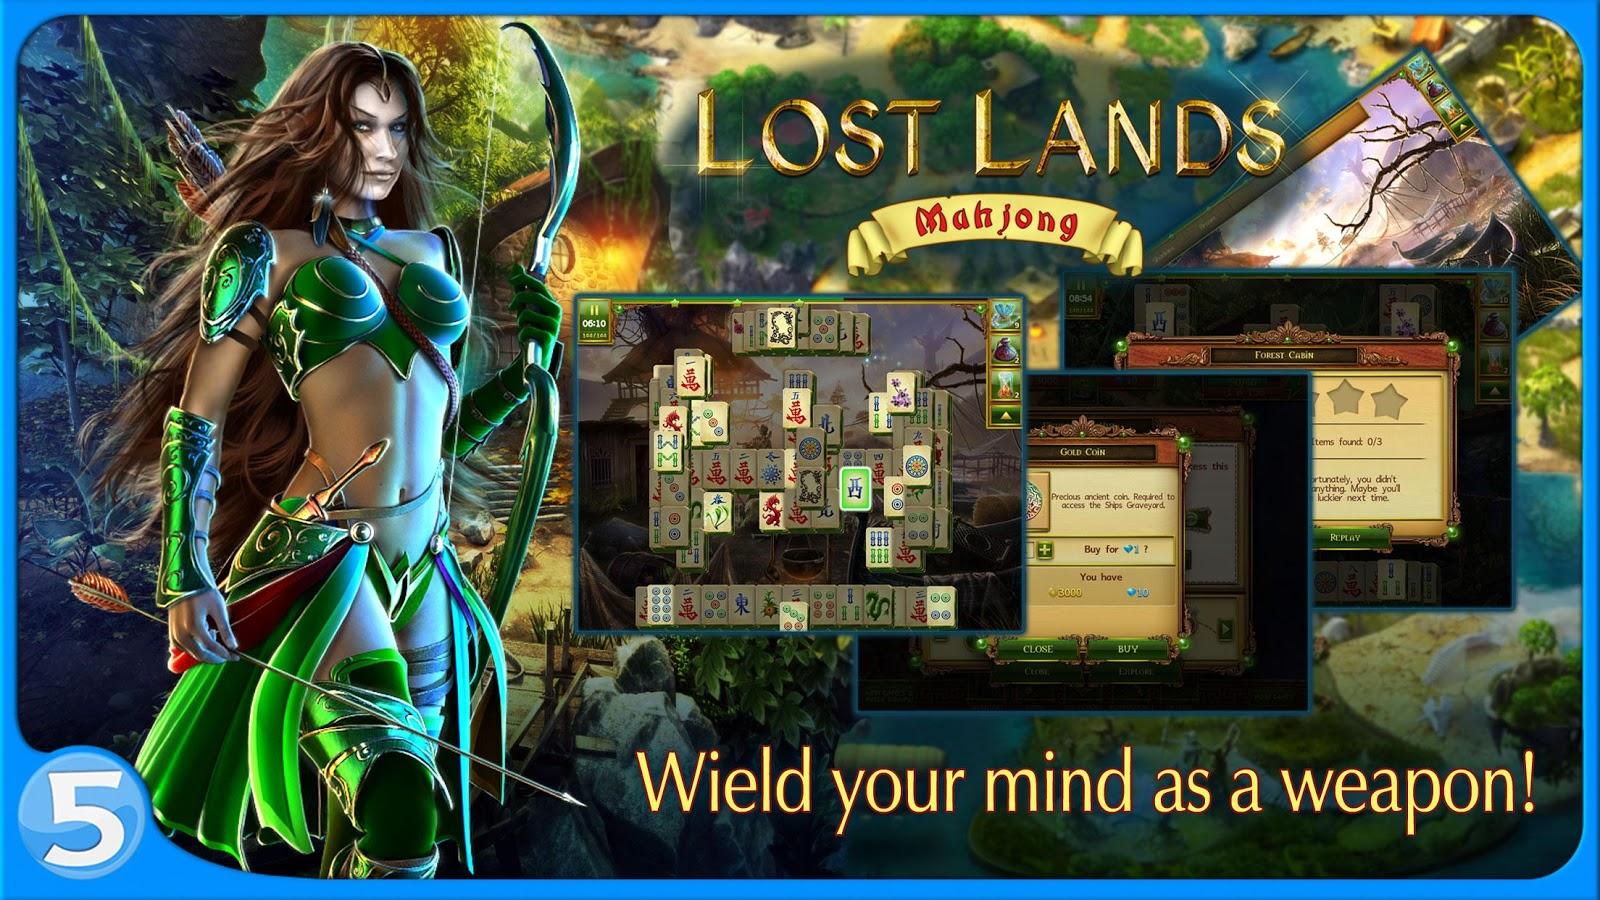 Lost Lands Mahjong Truhen